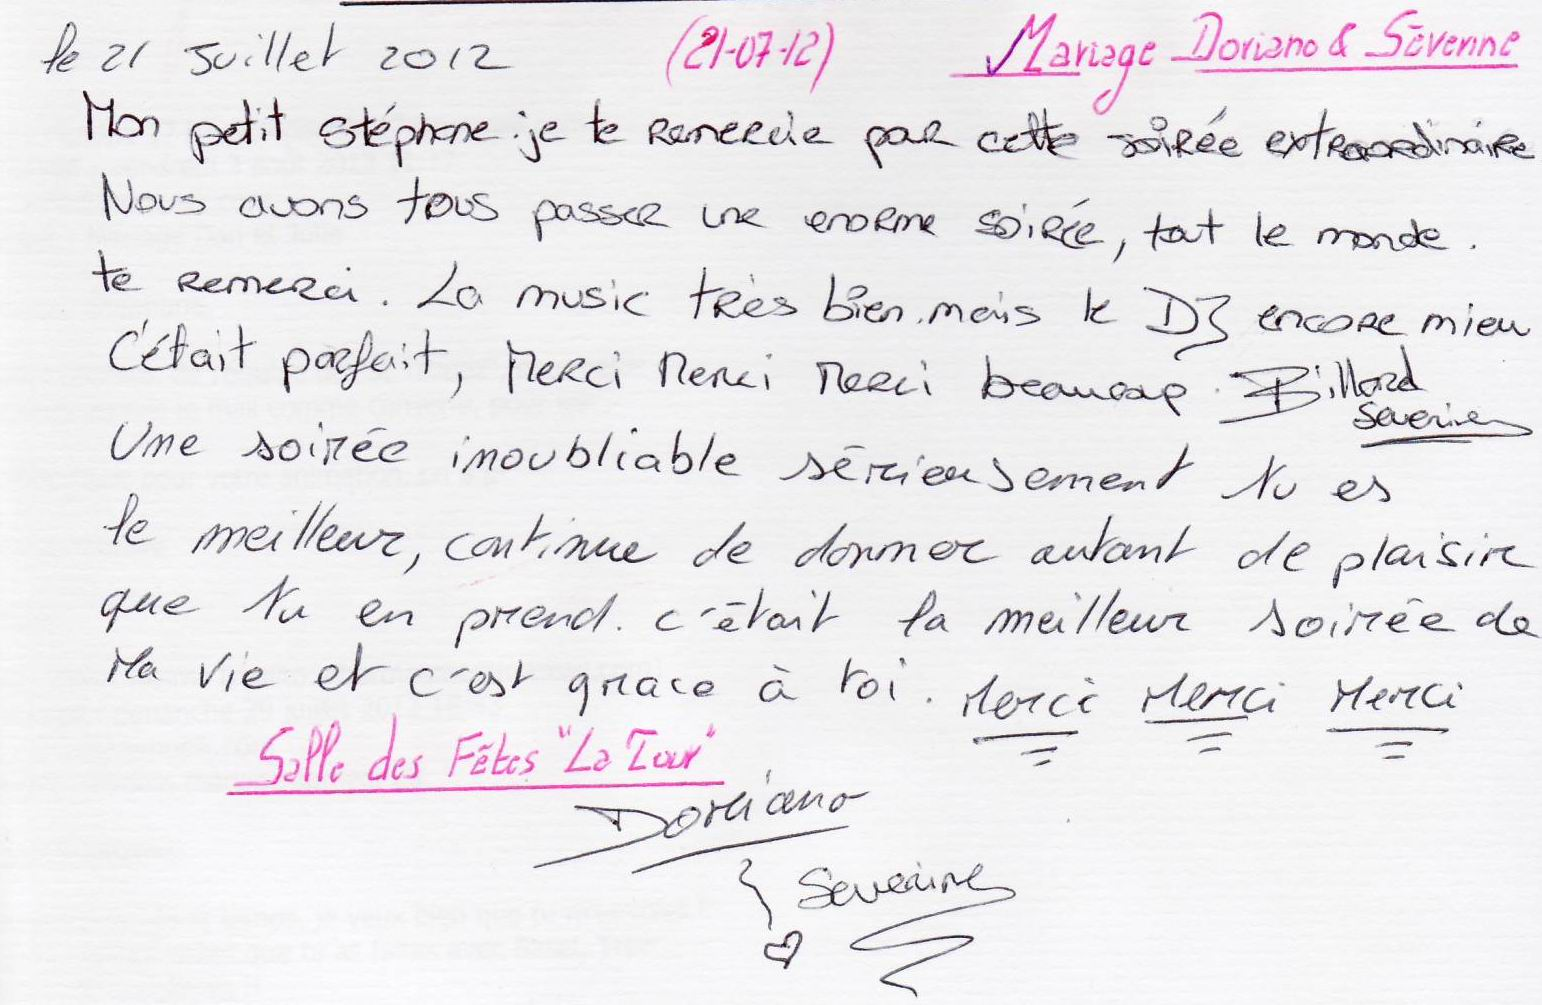 Mariage PIRAS Doriano & Séverine (La Tour) (21-07-2012)